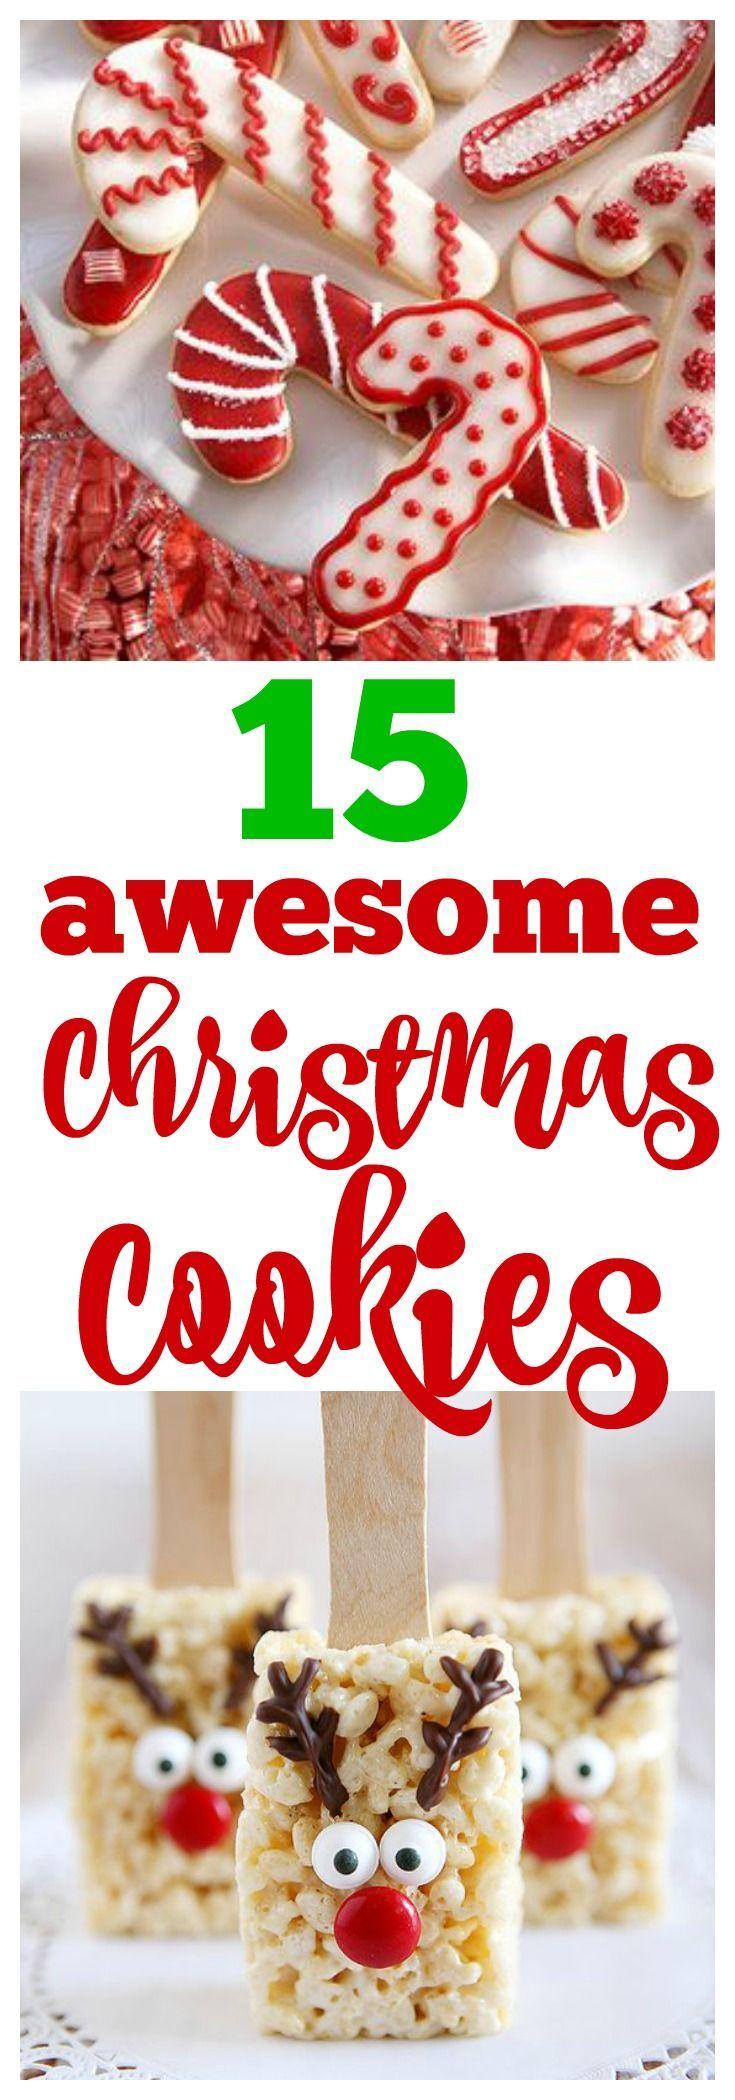 15 Awesome Christmas Cookies to Make This Year #christmascookies #christmas